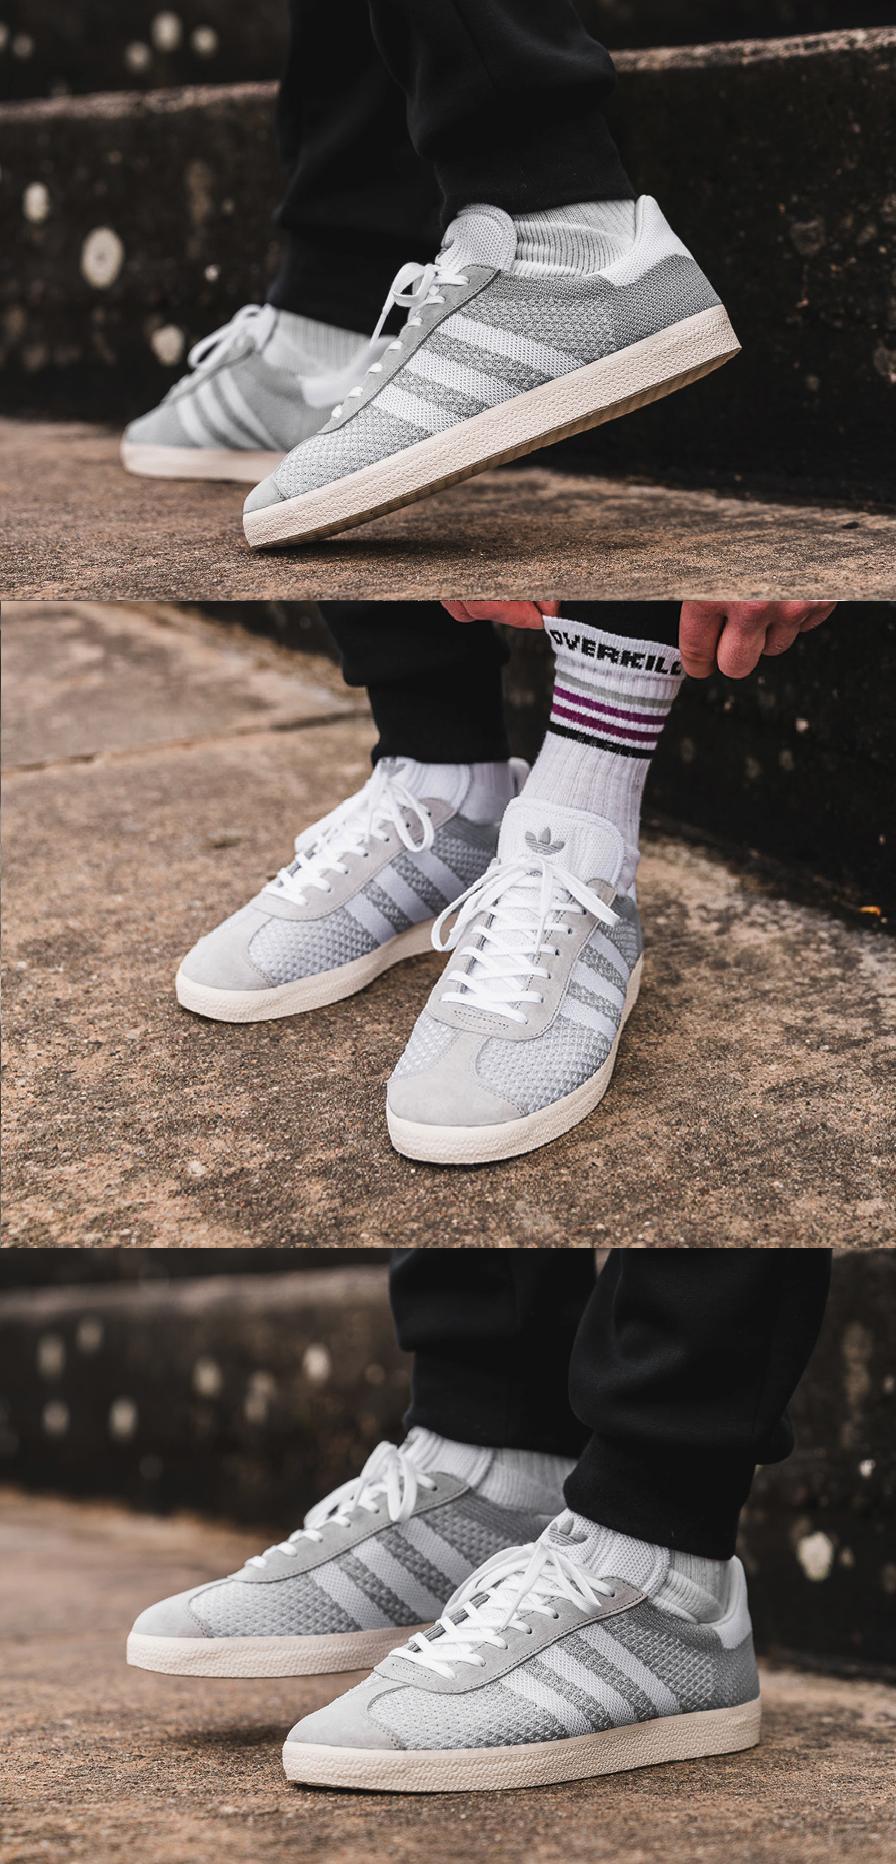 #Adidas #Gazelle #Primeknit #Clear #Onix http://www.